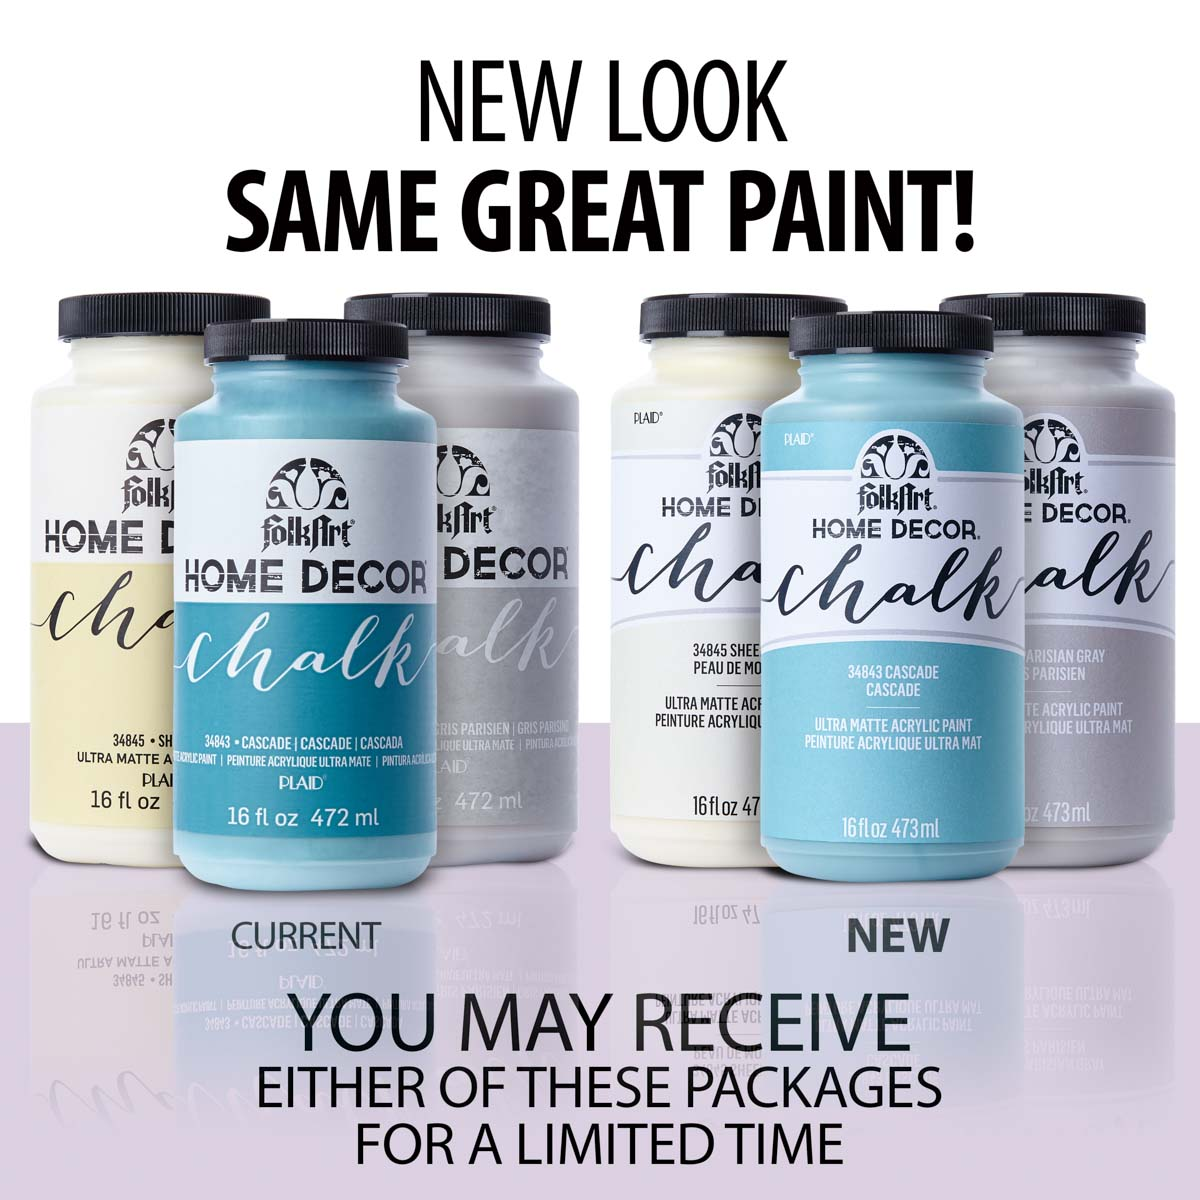 FolkArt ® Home Decor™ Chalk - Rich Black, 16 oz. - 34844